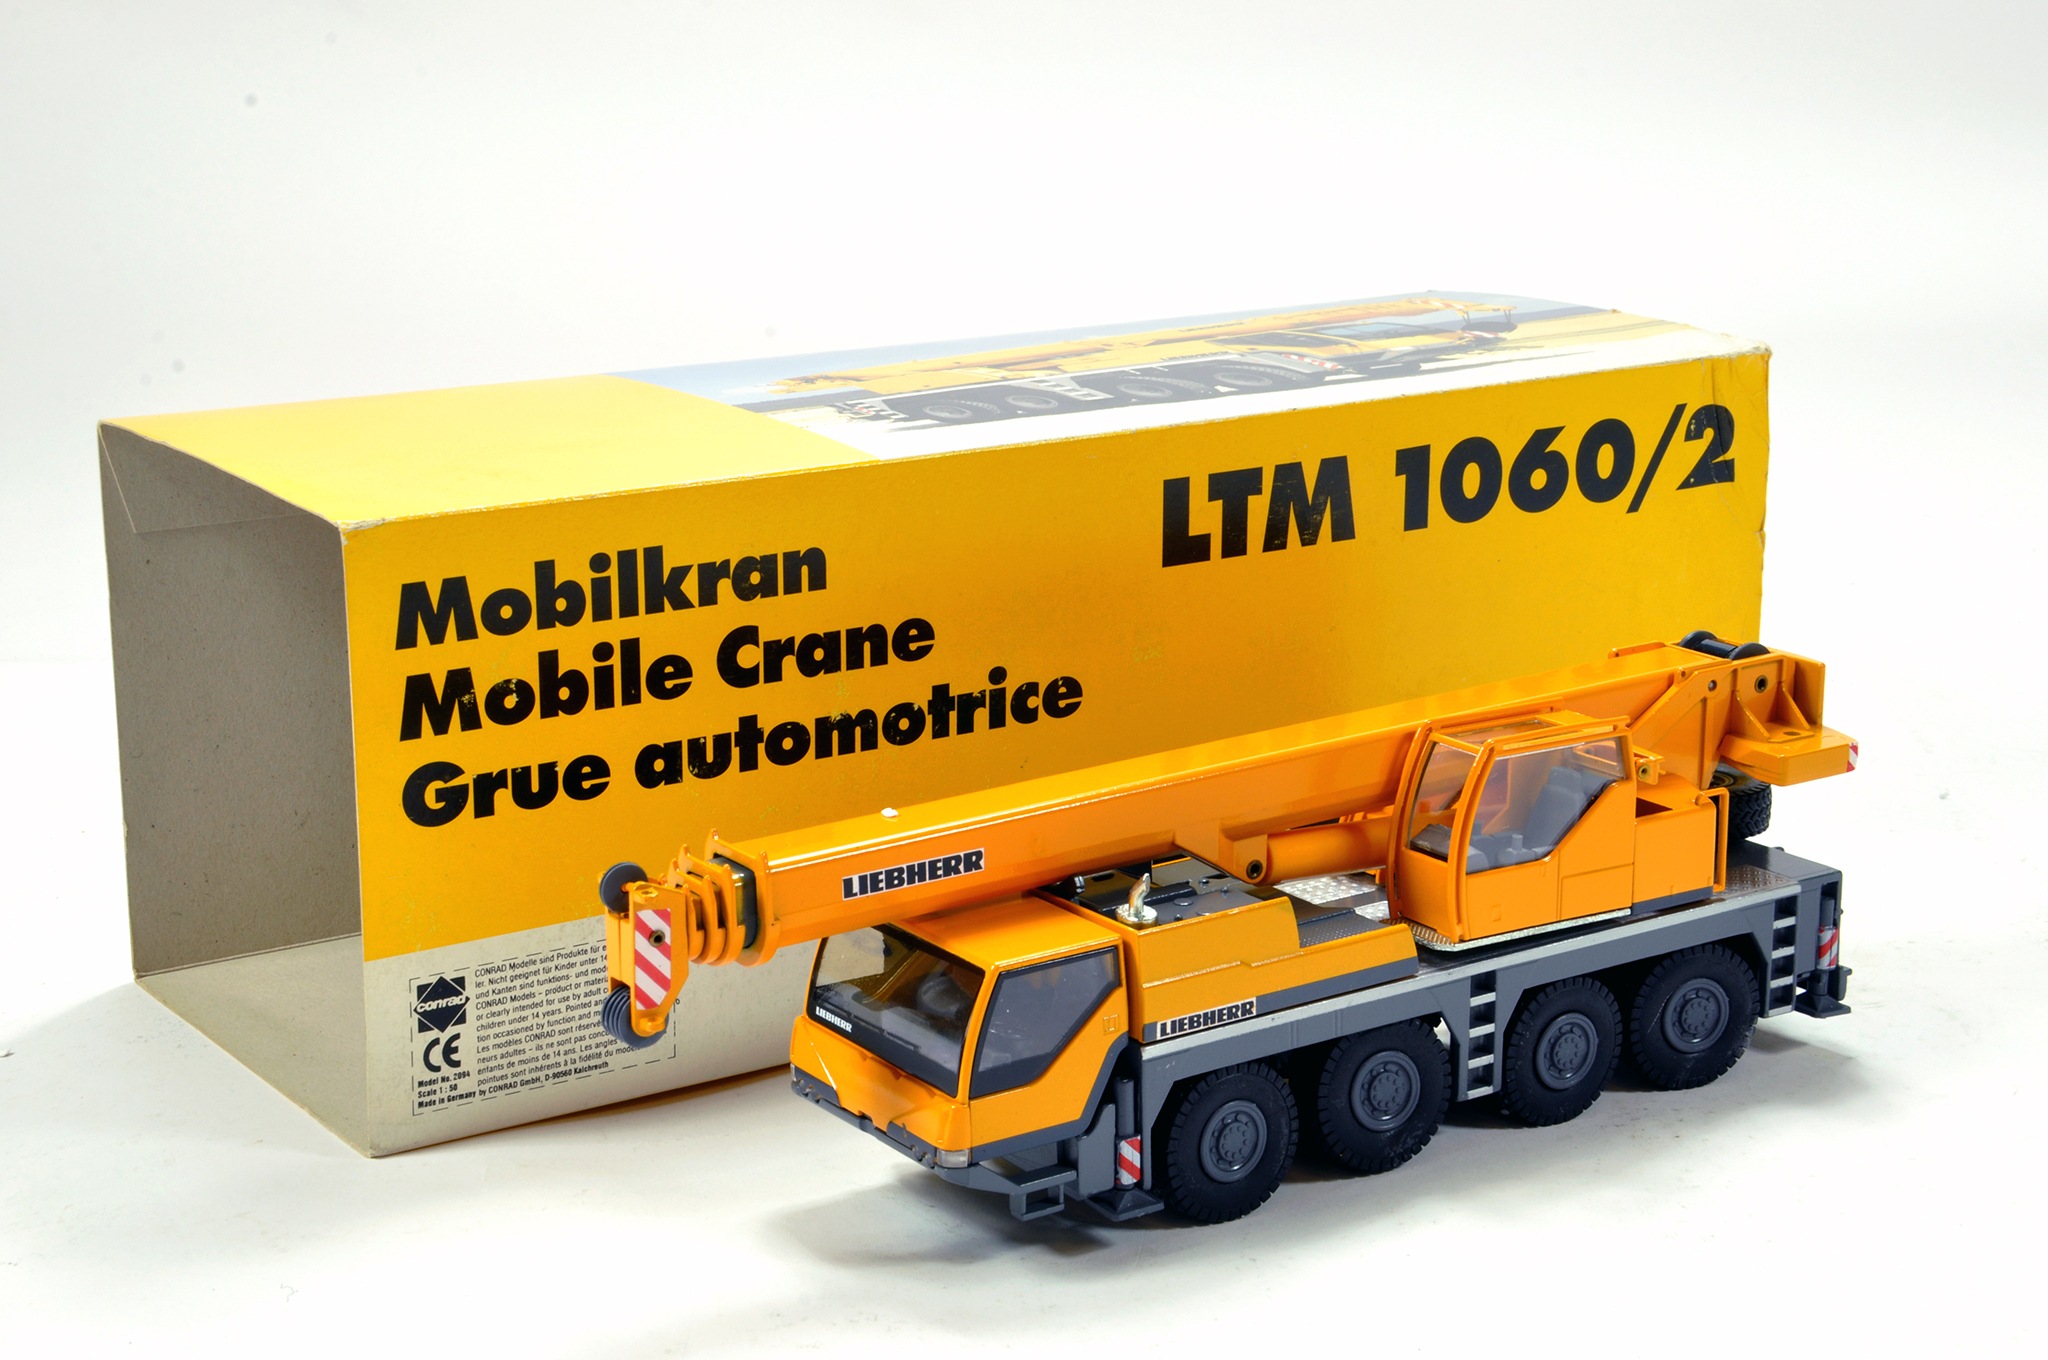 Lot 344 - Conrad 1/50 construction issue comprising Liebherr LTM1060/2 Mobile Crane. E to NM.